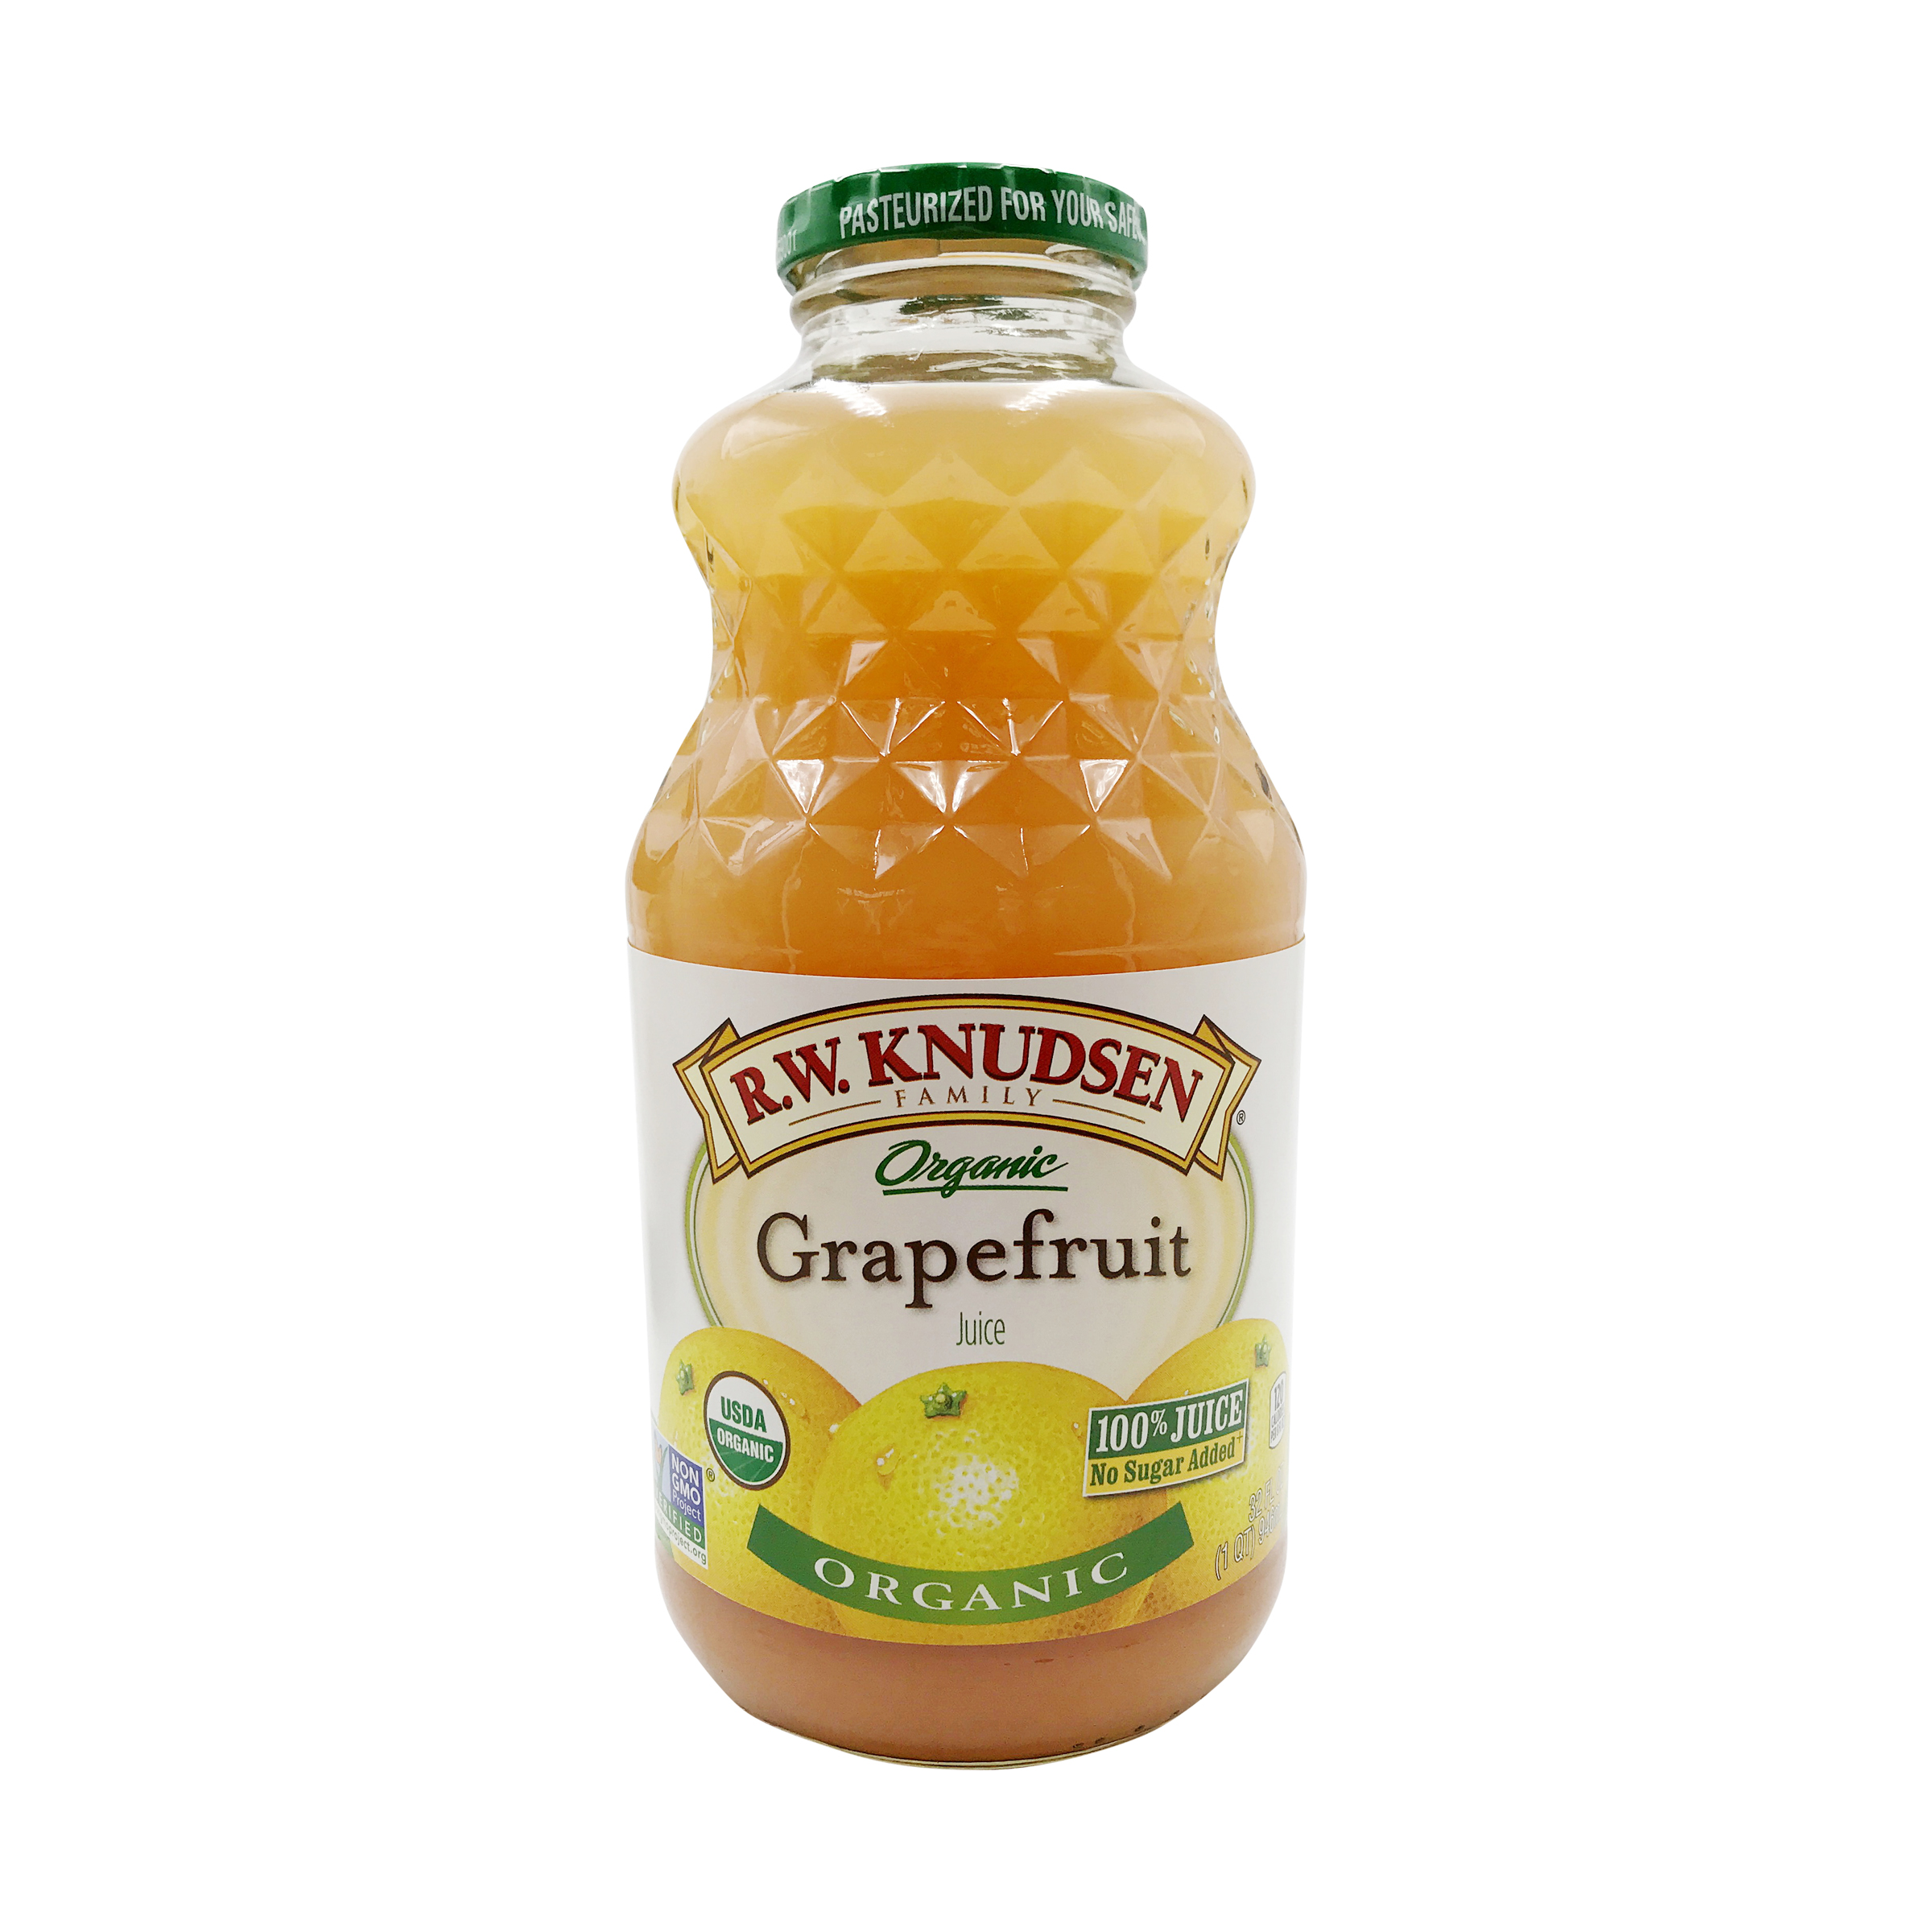 Organic Grapefruit Juice, 32 fl  oz , R W  Knudsen Family